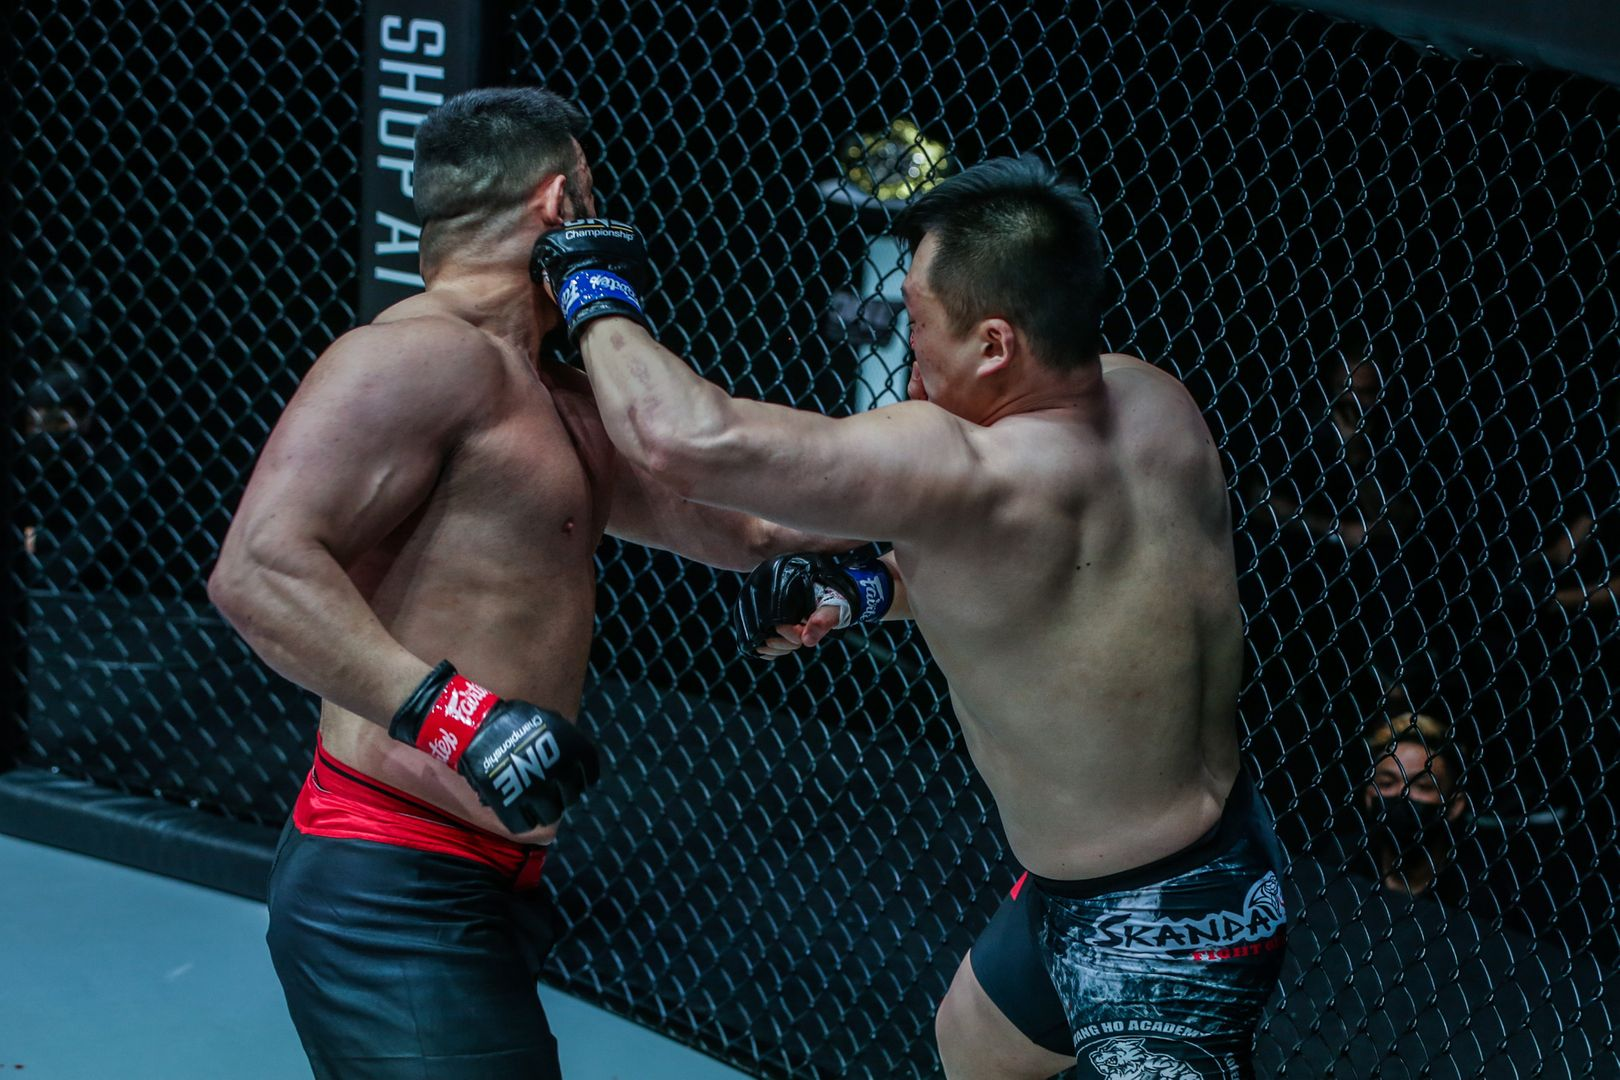 ONE-Fists-of-Fury-II-Kang-Ji-Won-def-Amir-Aliakbari Vera warning to Aliakbari proved right: 'It's different in ONE Championship' Mixed Martial Arts News ONE Championship  - philippine sports news